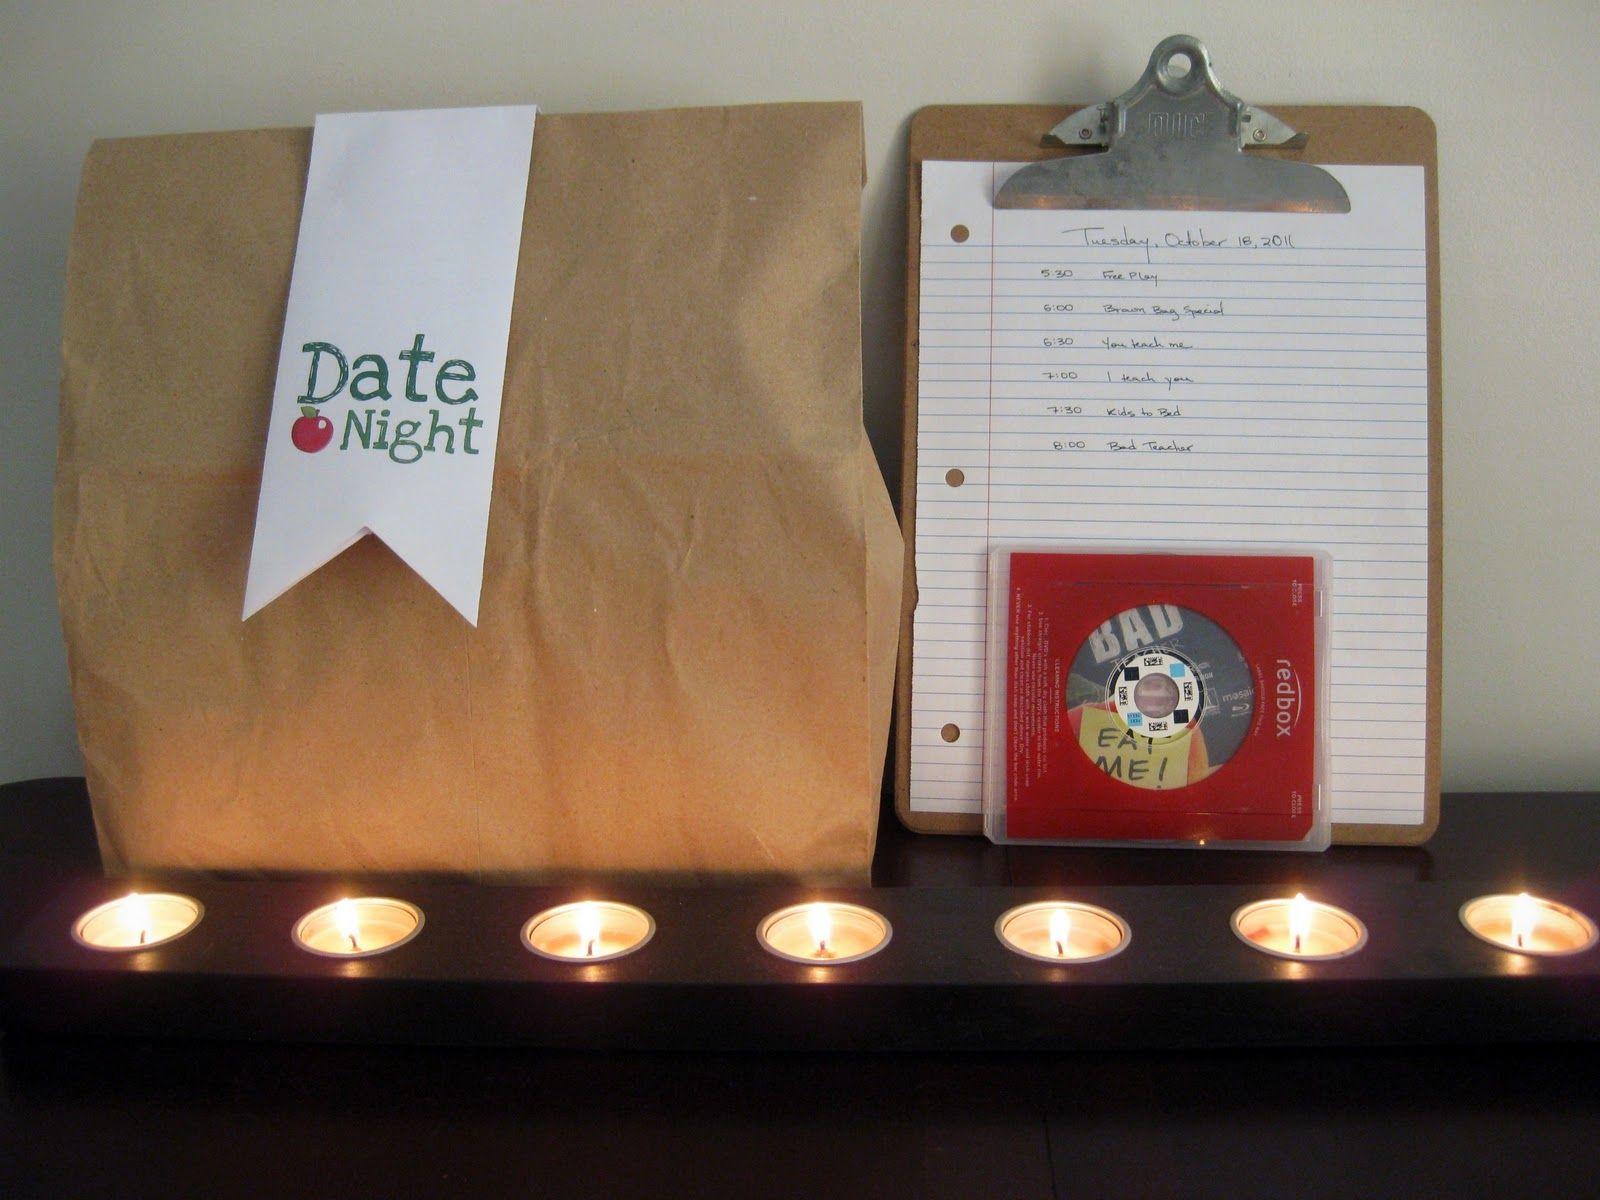 Beginner Beans Brown Bag Date Night Date